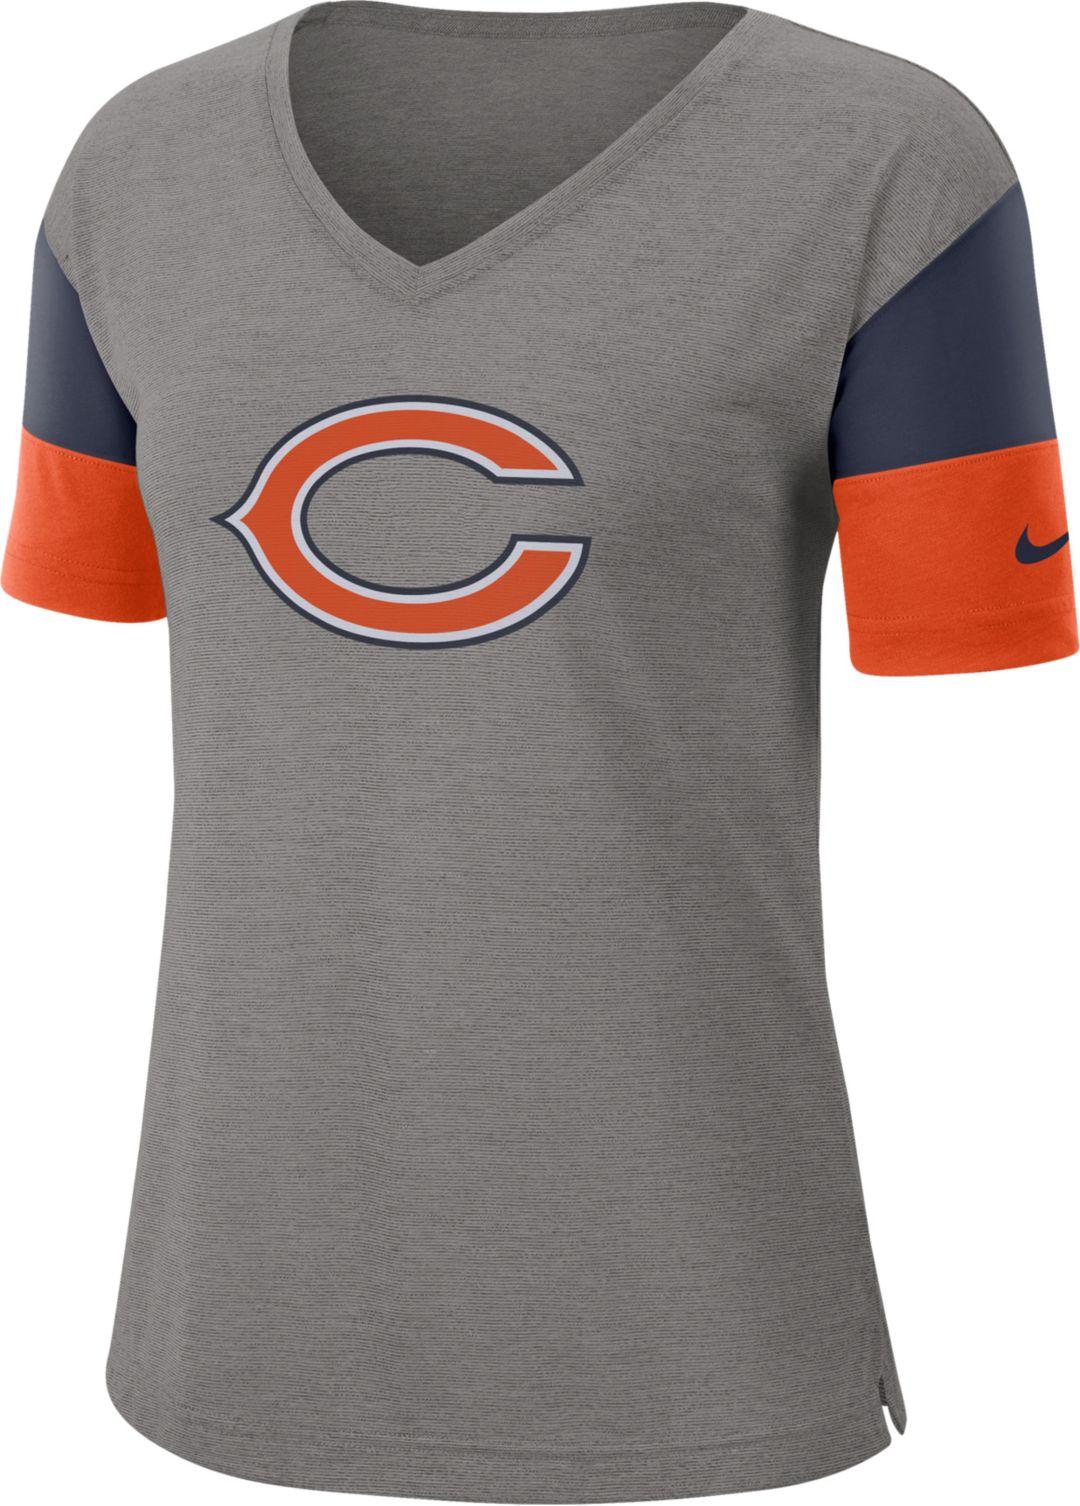 new style 7cccd f46be Nike Women's Chicago Bears Breathe Heather Grey V-Neck T-Shirt